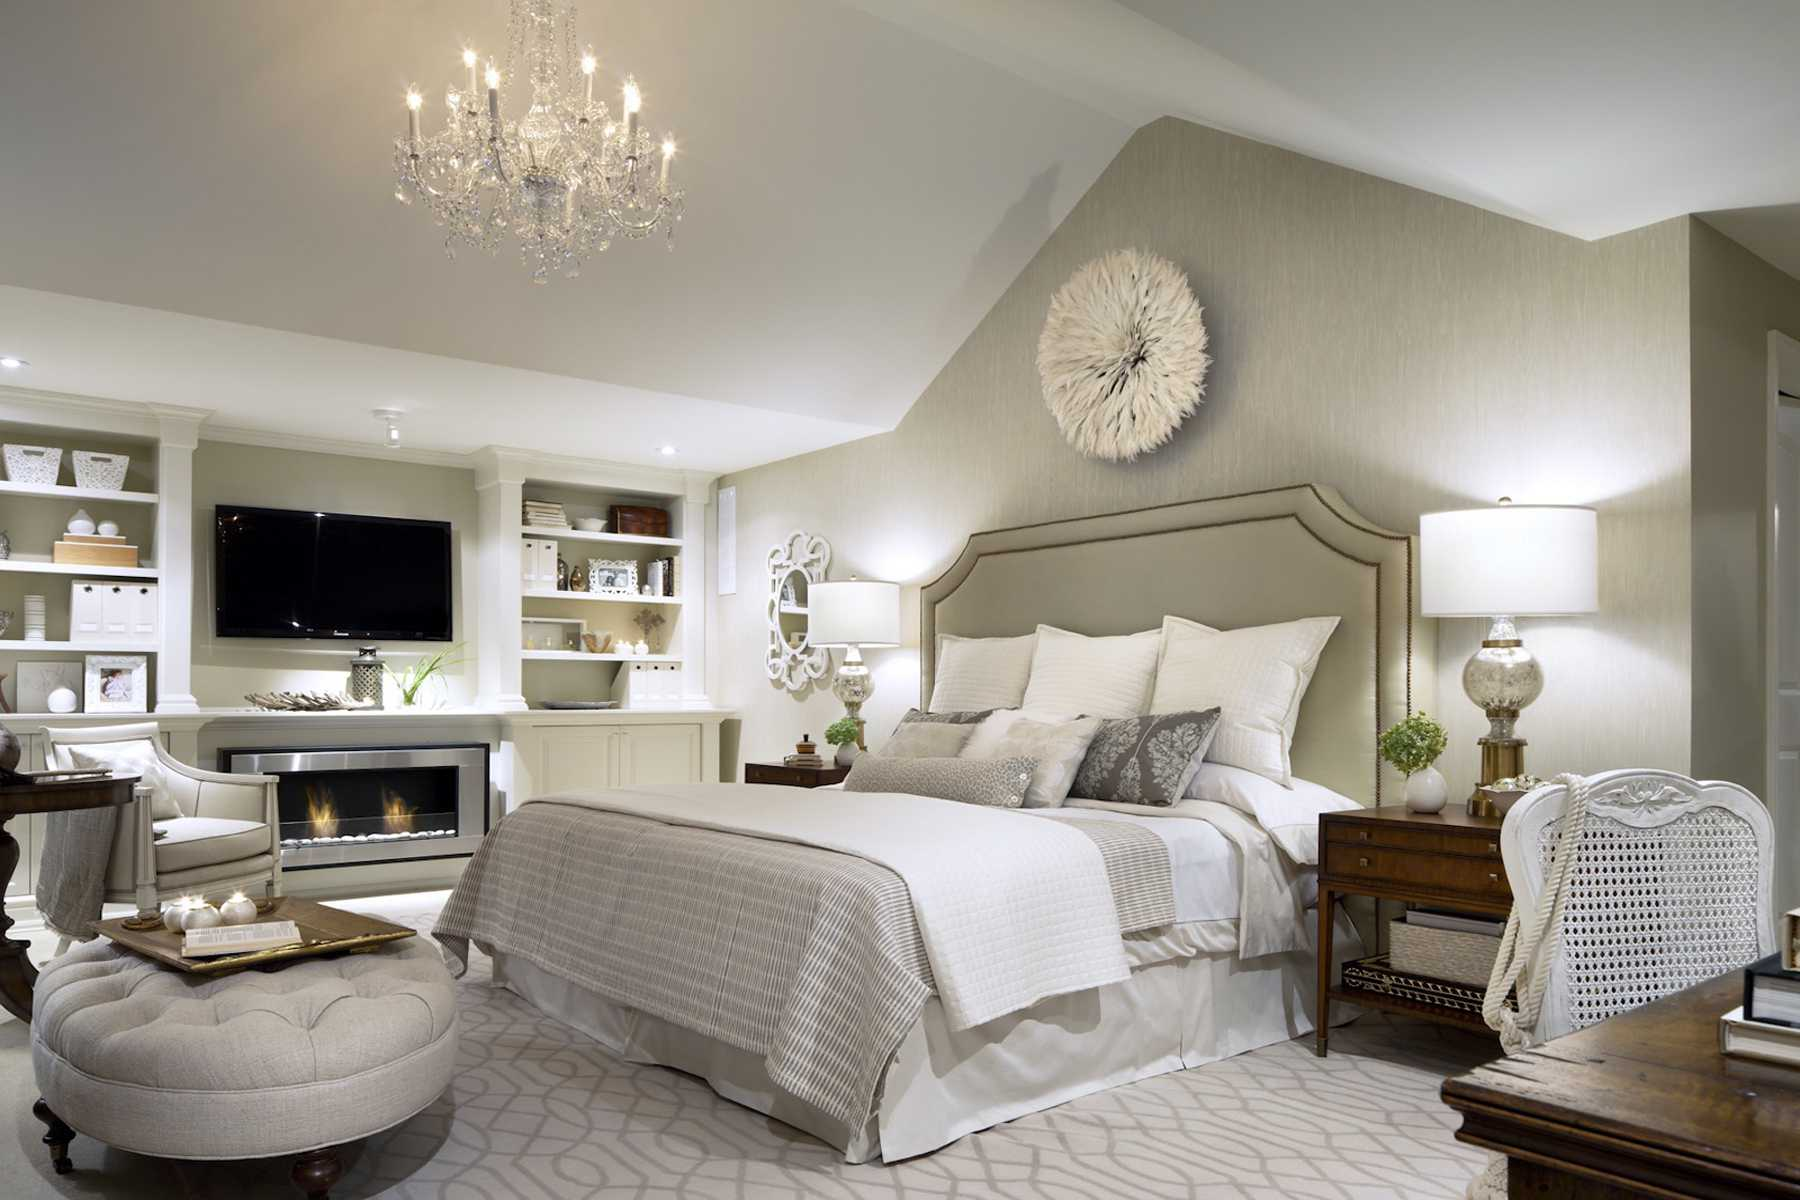 Interior Designers Long Island 631 294 3446